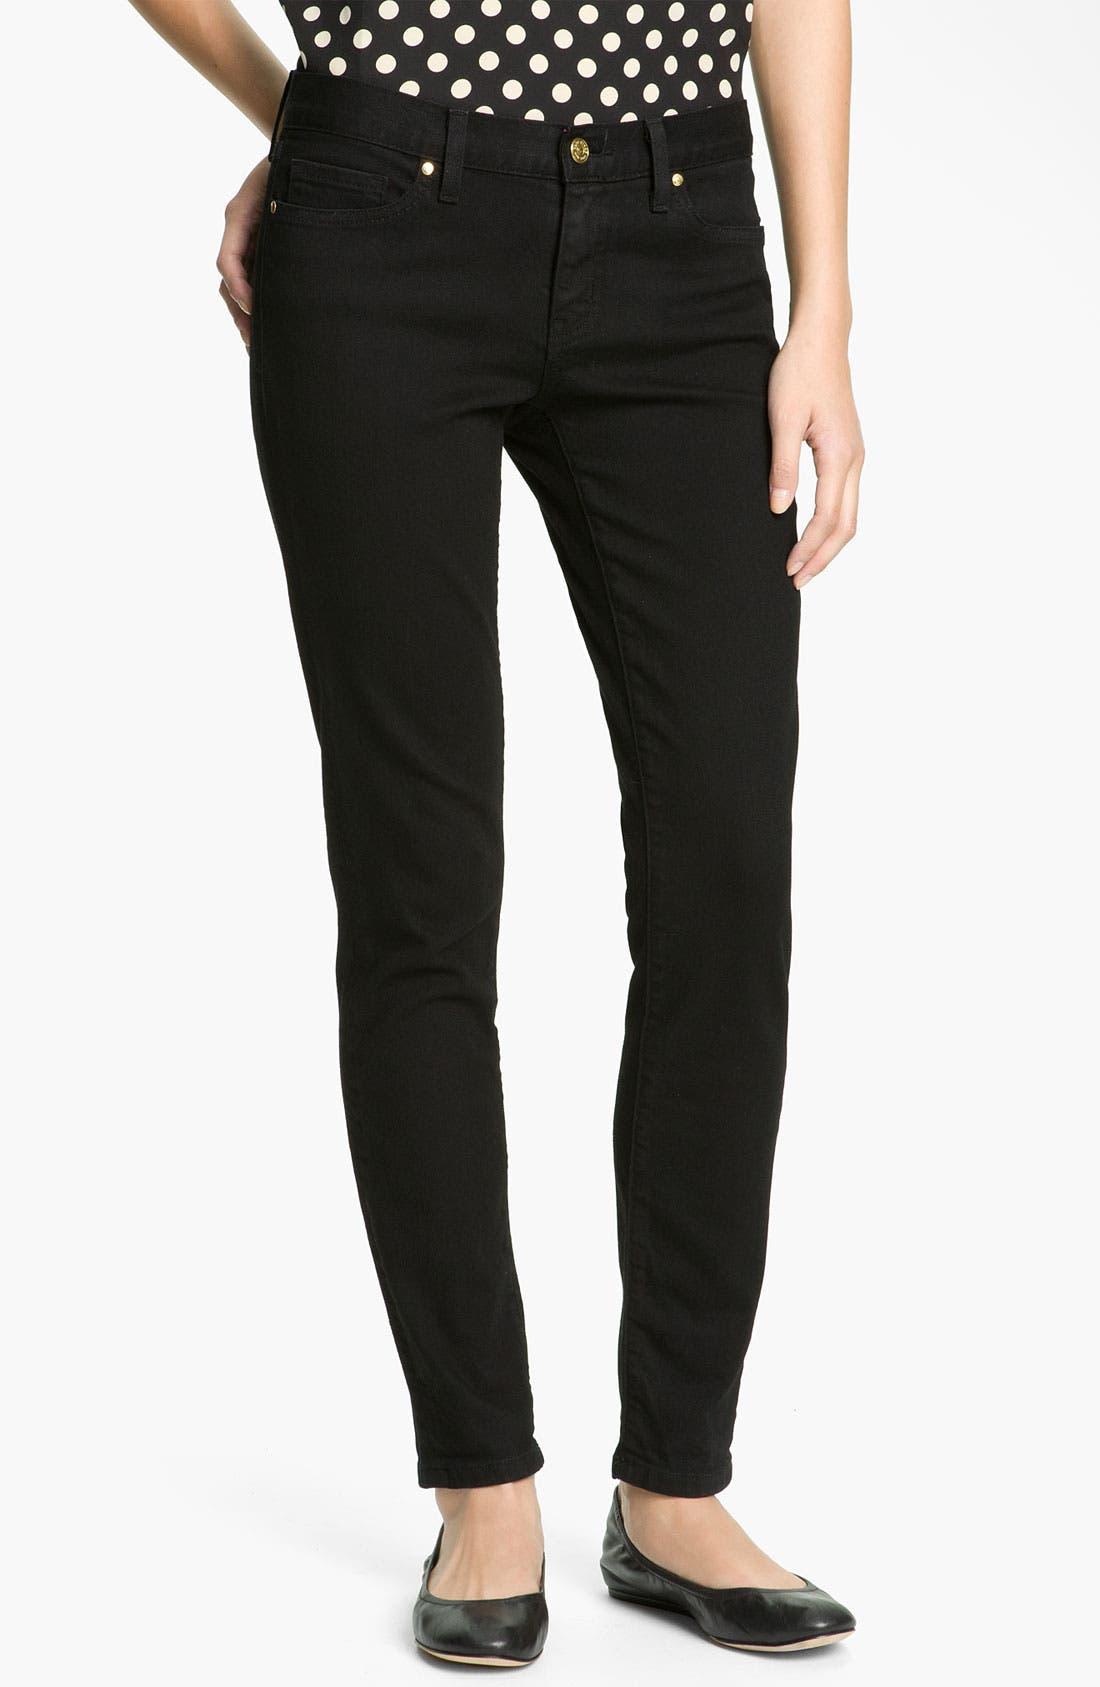 Main Image - kate spade new york 'broome street' skinny jeans